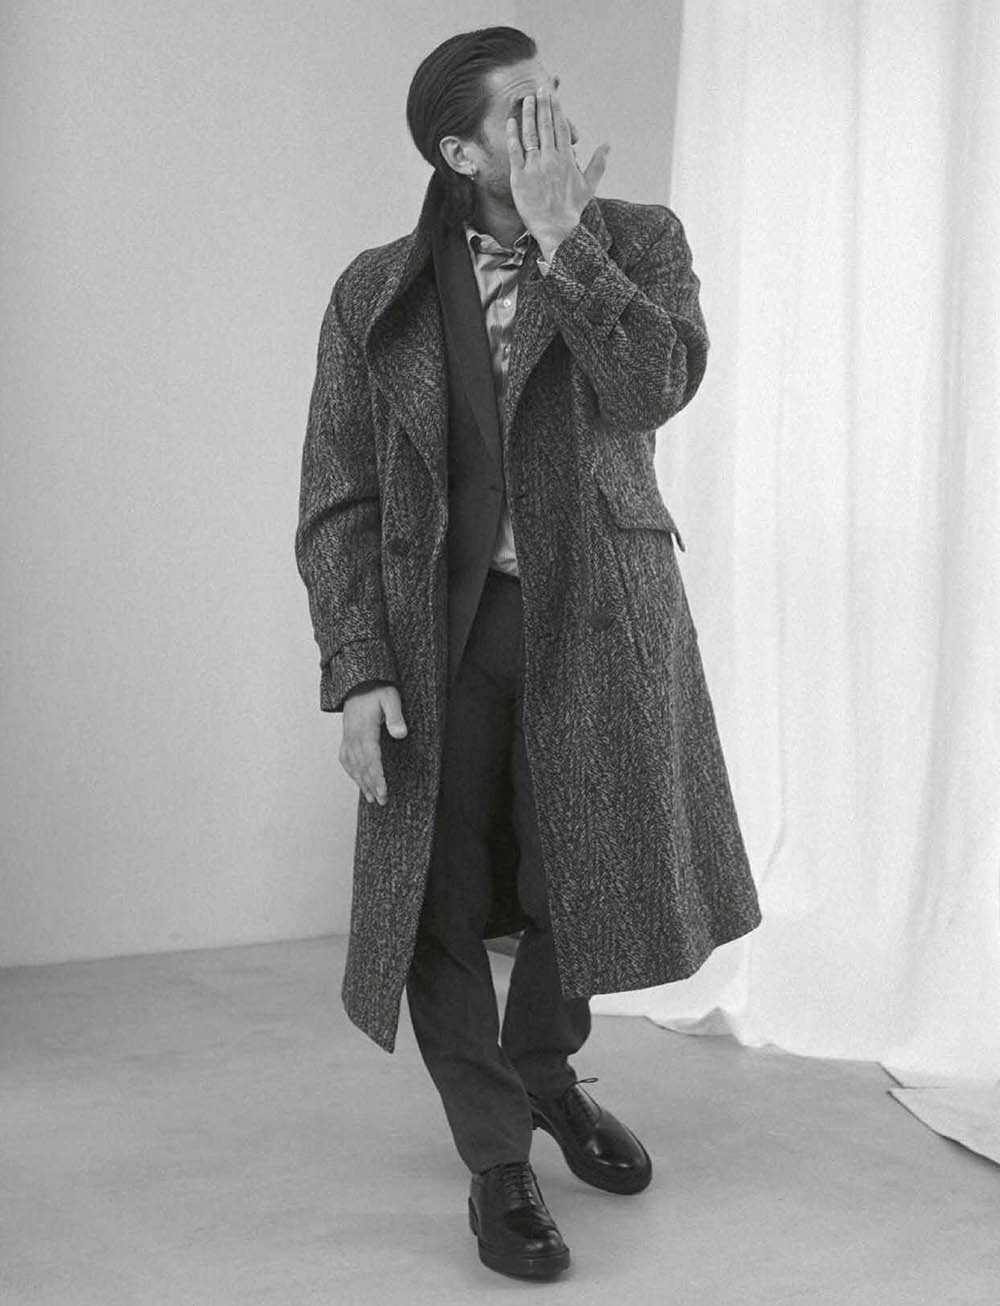 Luca Marinelli covers GQ Italia November 2020 by Mark Pillai